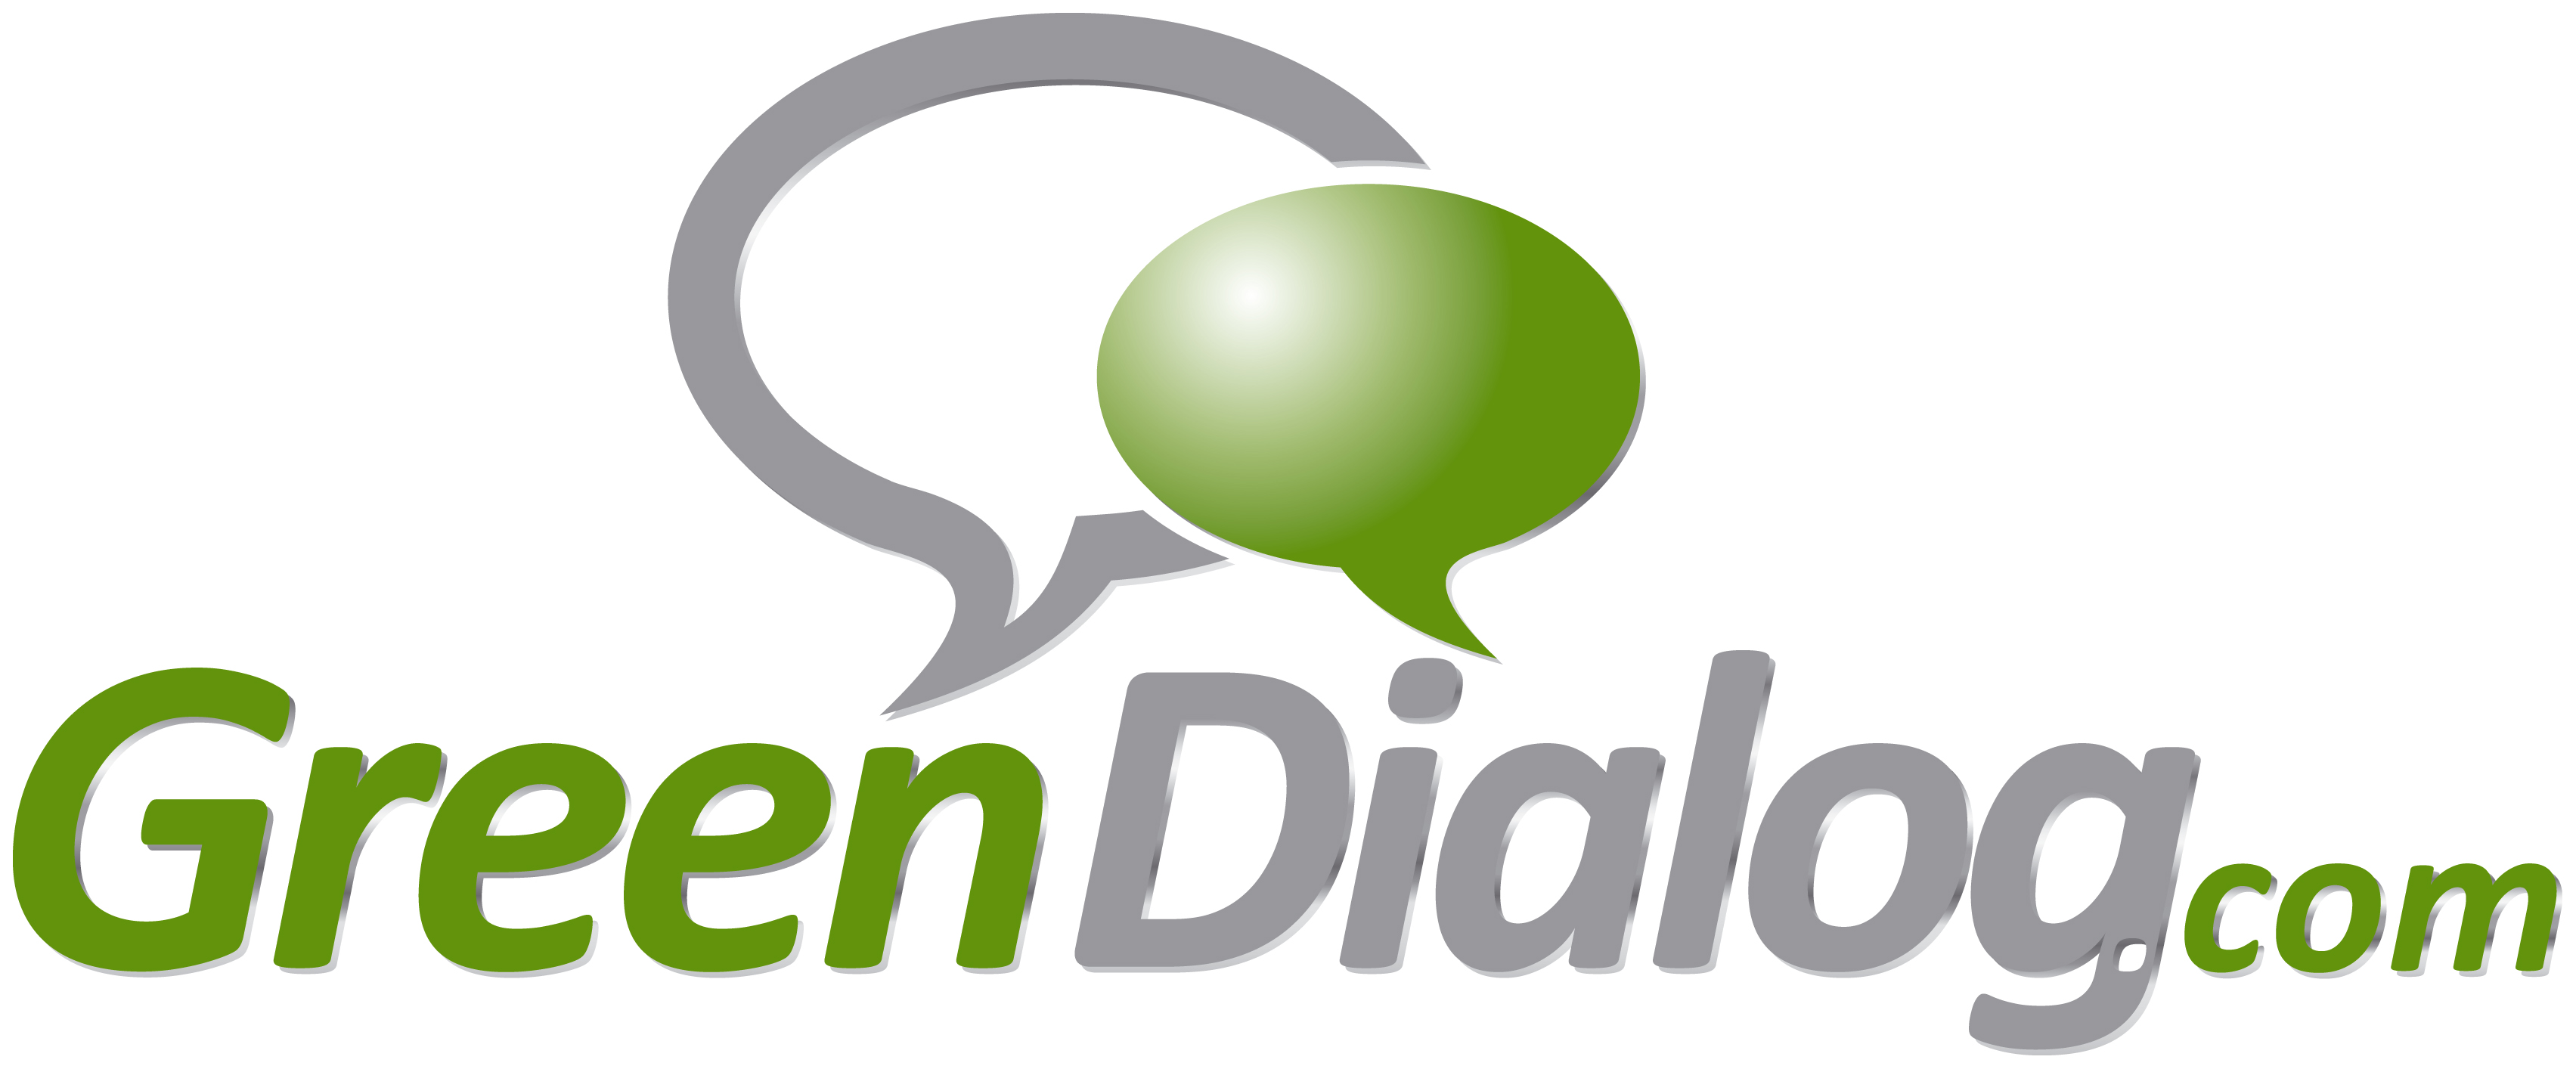 greendialog